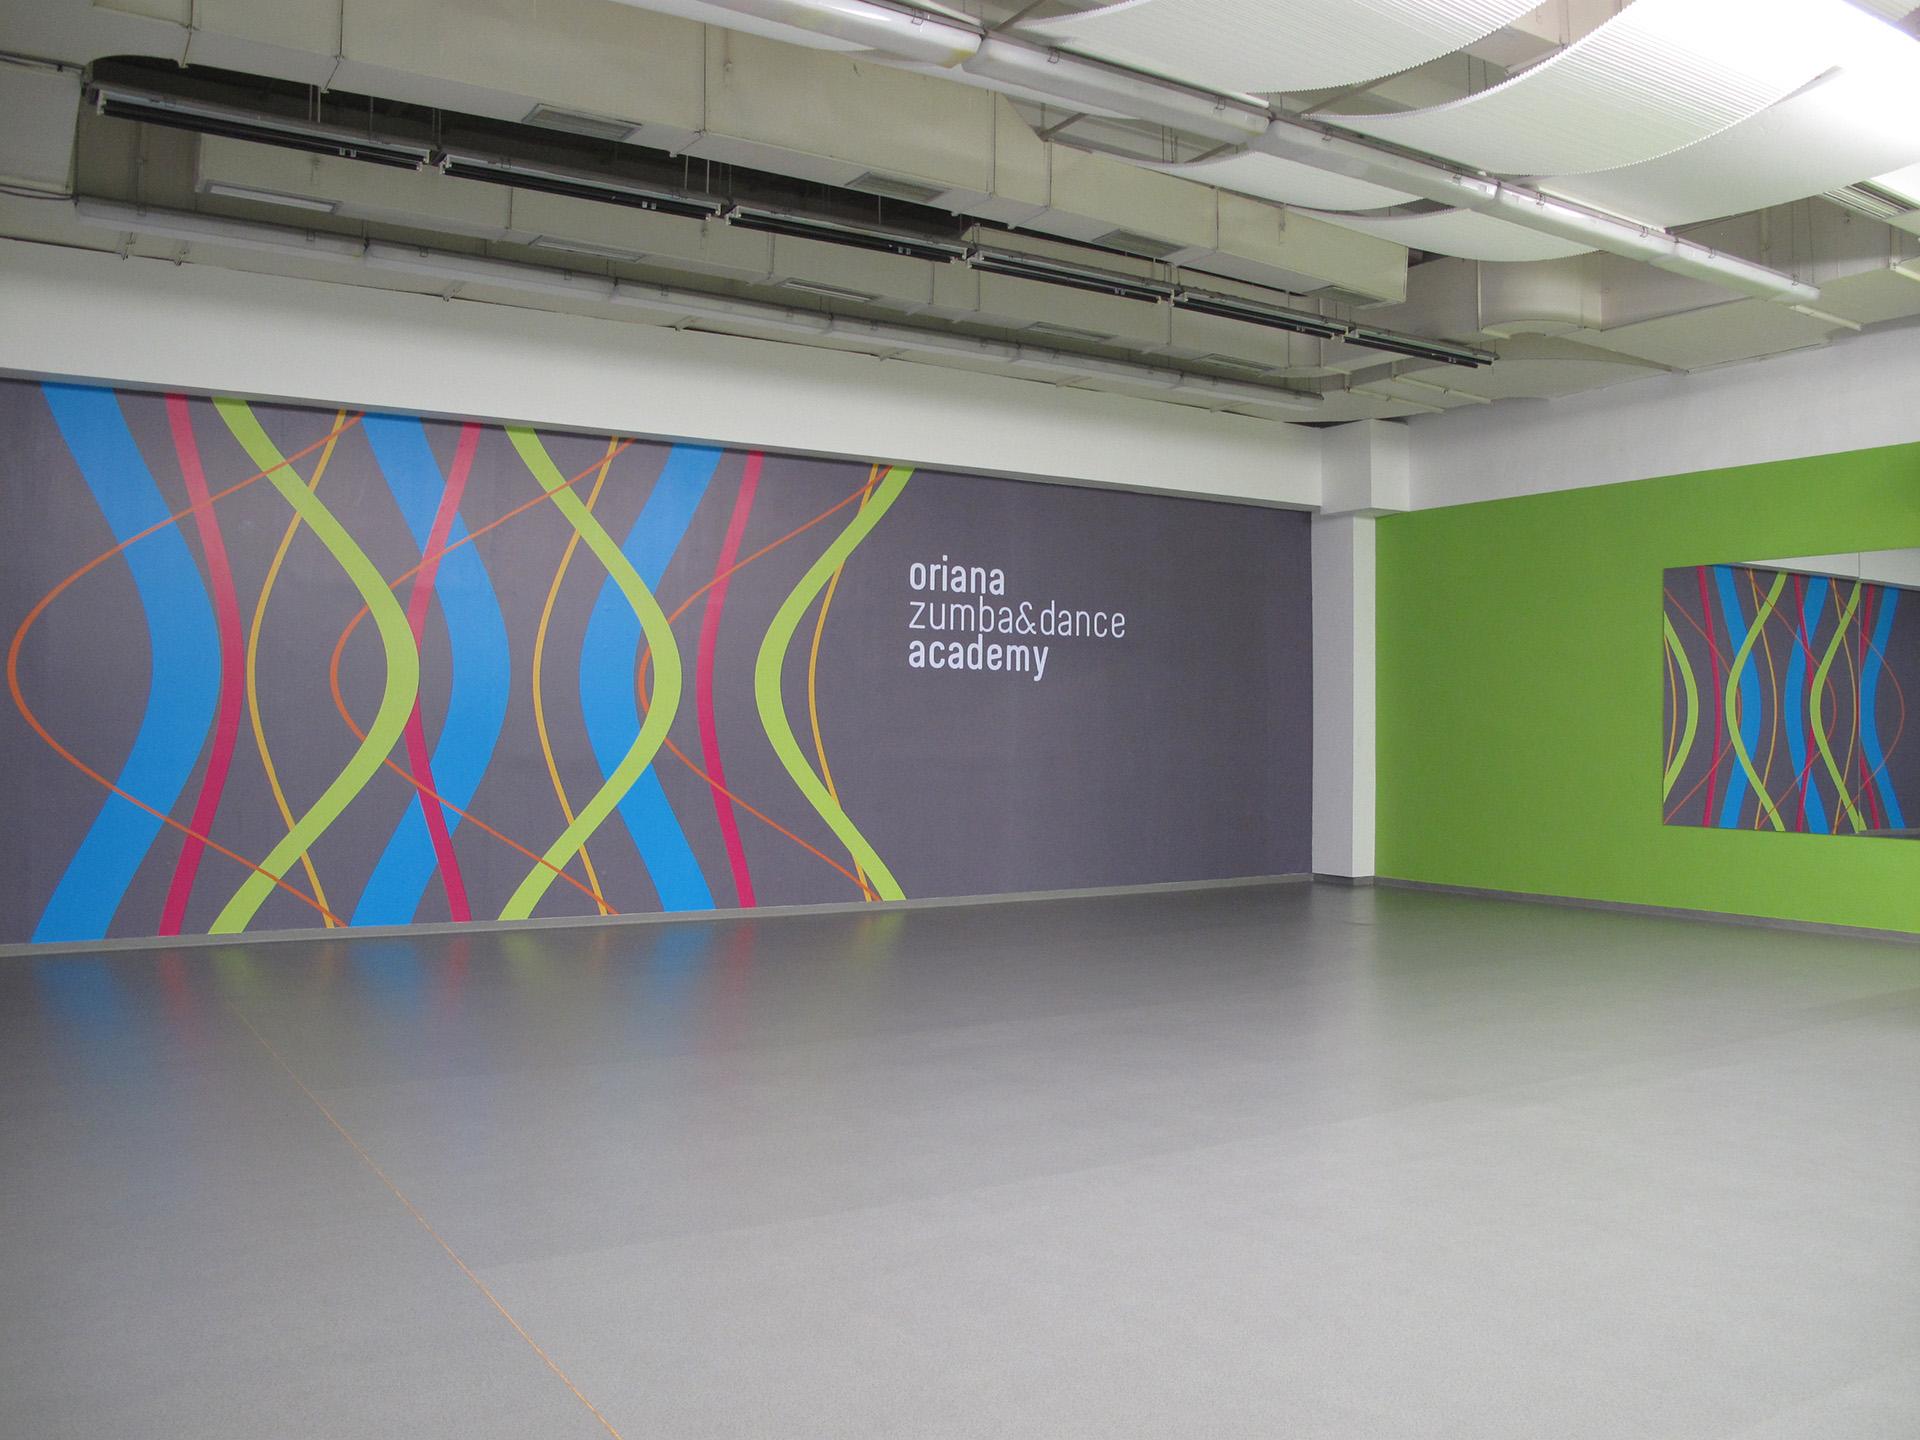 Zumba dance academy